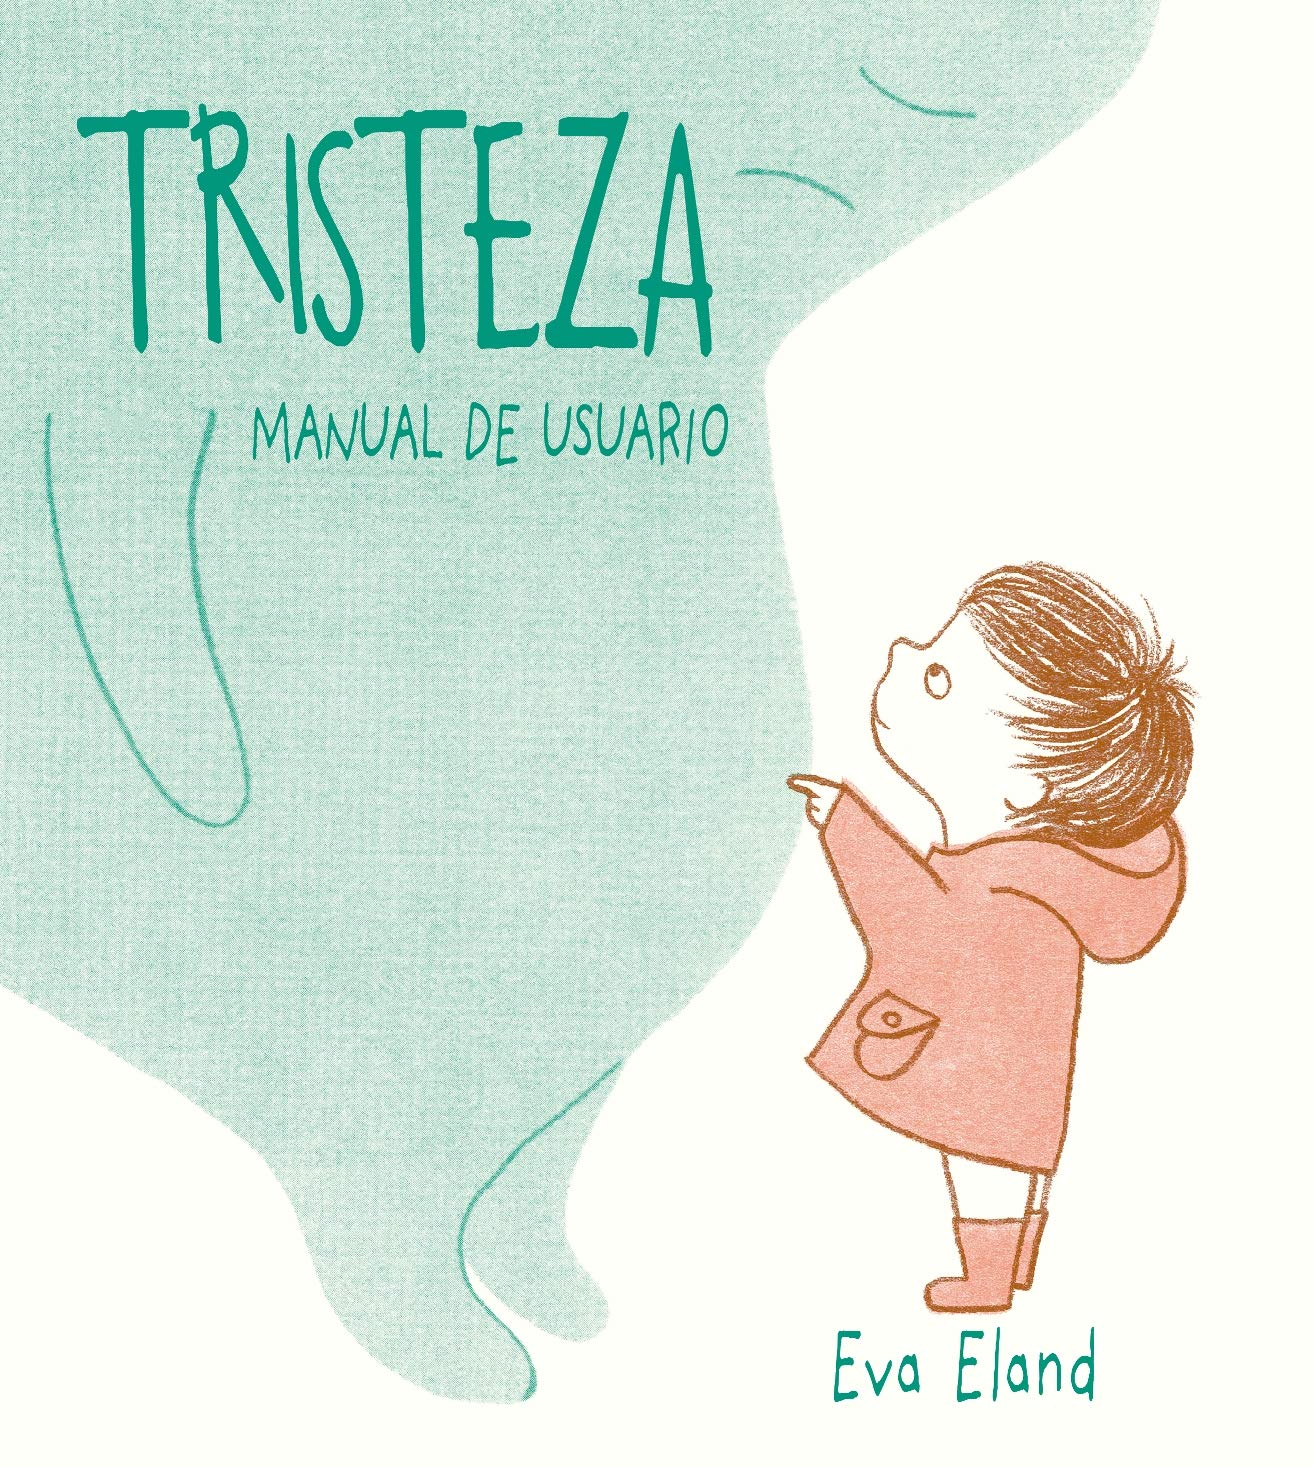 Tristeza. Manual de usuario (PICARONA): Amazon.es: ELAND, EVA, TARANILLA BOSSANA, VERÓNICA: Libros